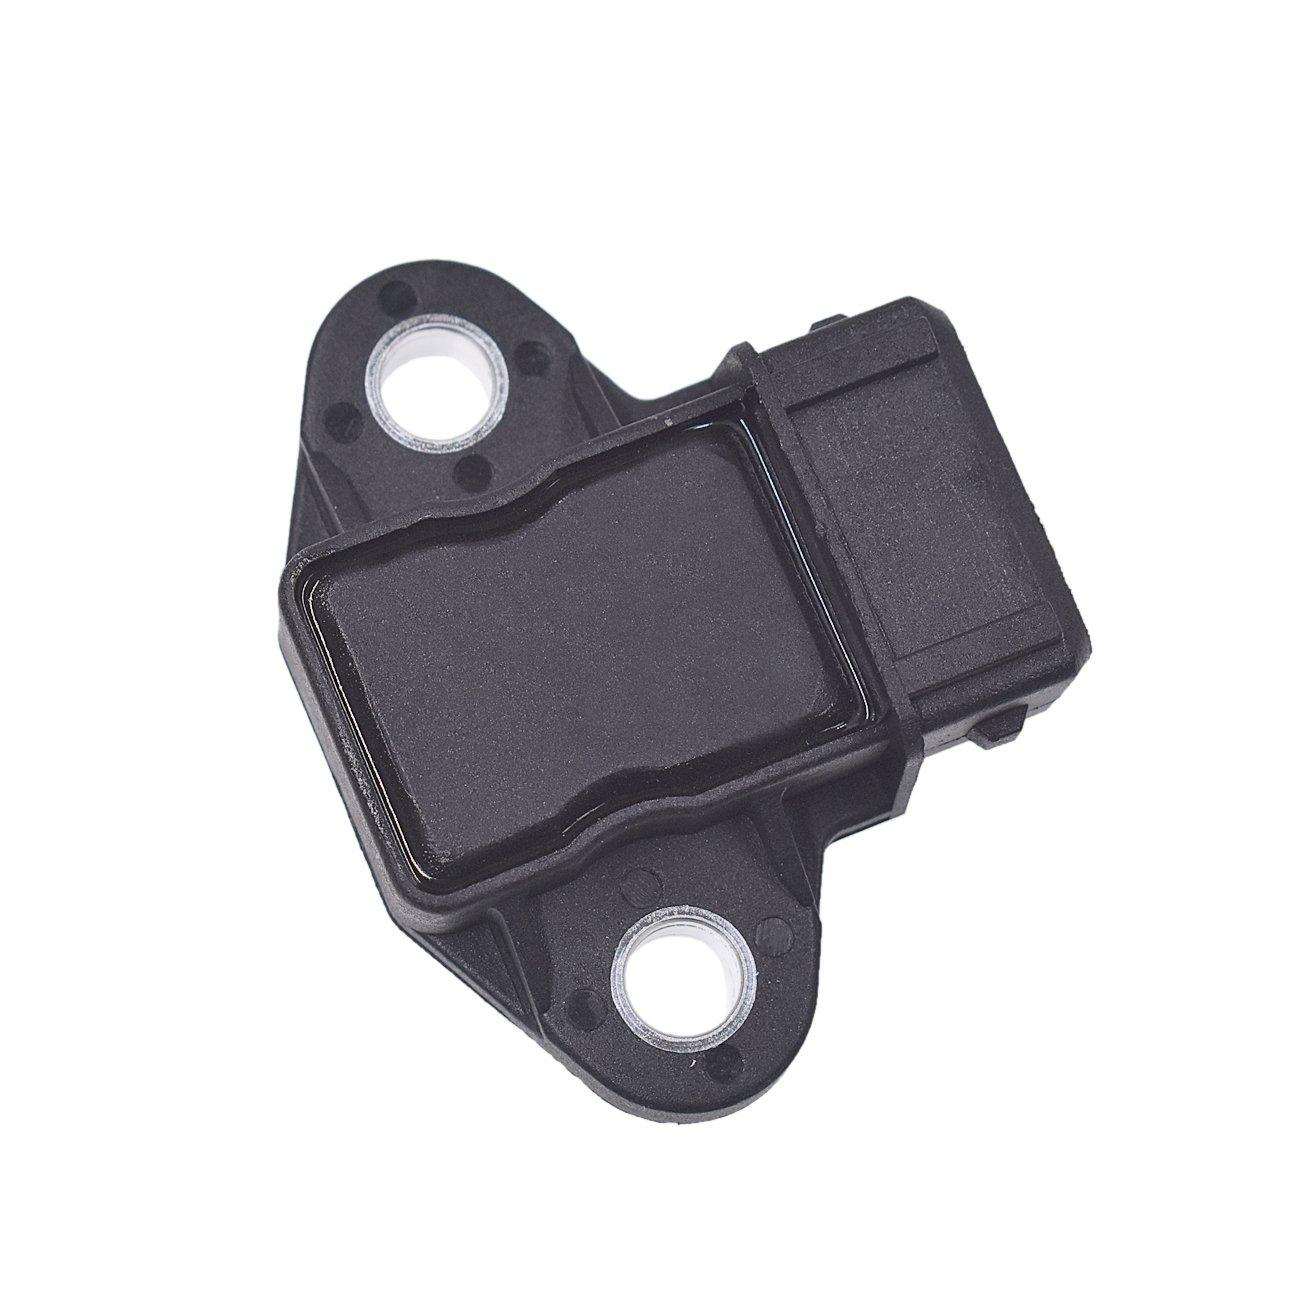 JRL Ignition Control Module Misfire Sensor J5T60572 For Mitsubishi Galant 2.4 3.0